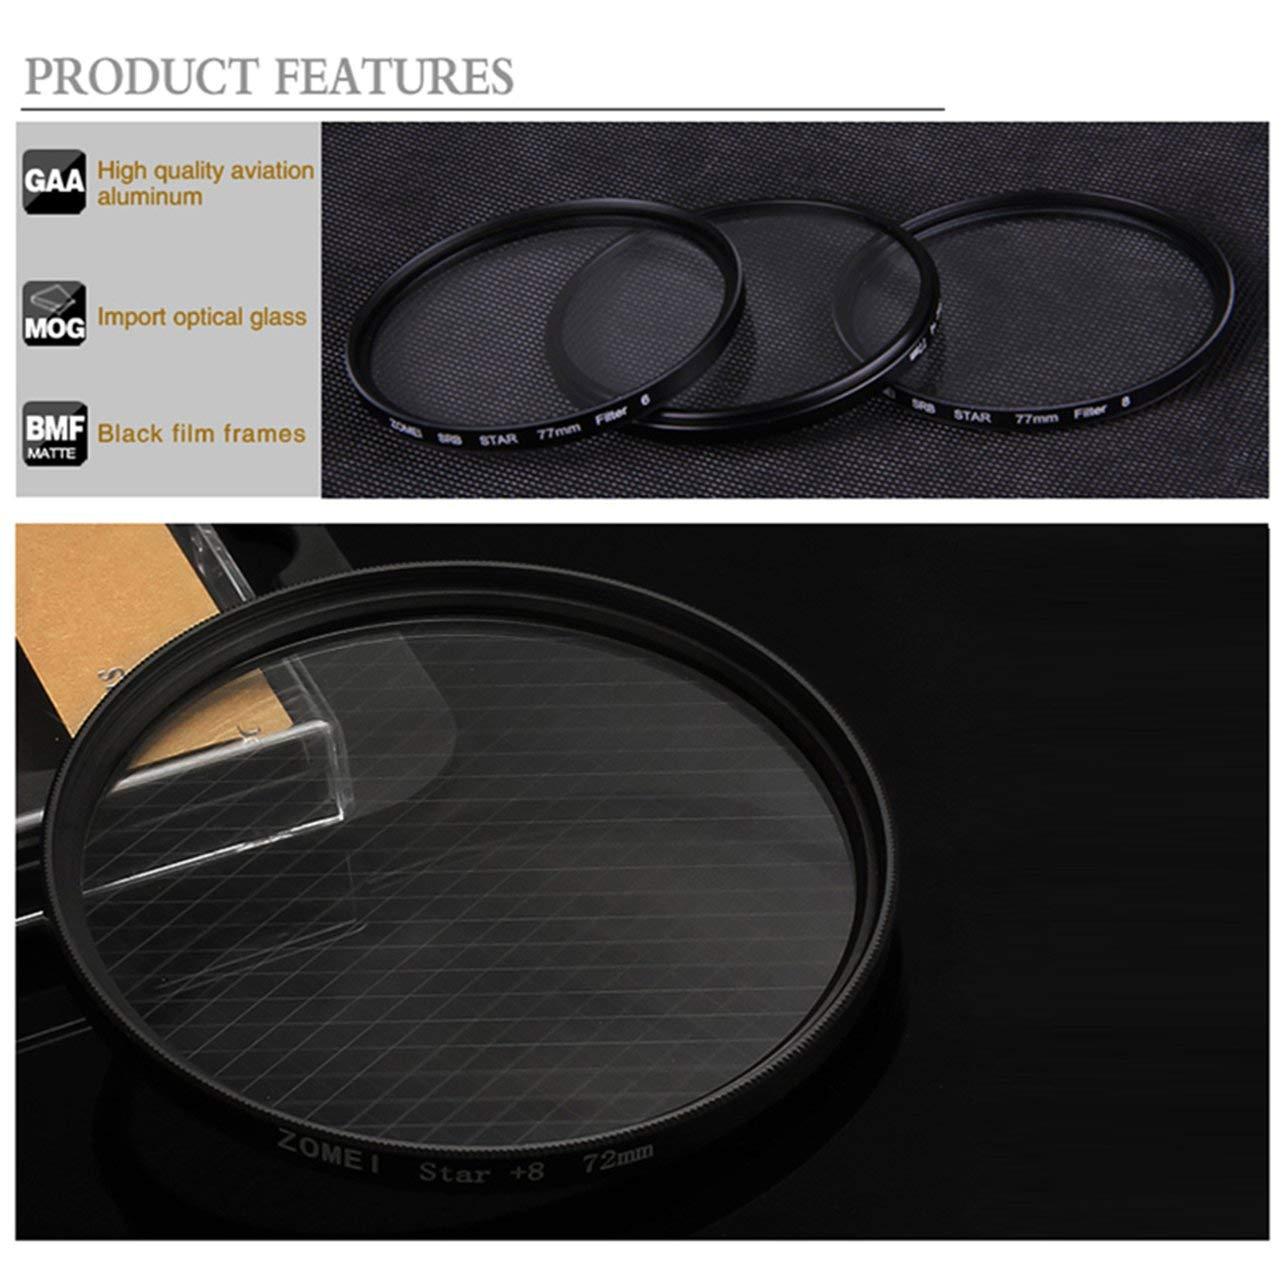 Filtrer 6 Lignes ZOMEI Star Filter Perfect Lens Professional Point Lens (Couleur: Noir) WOSOSYEYO